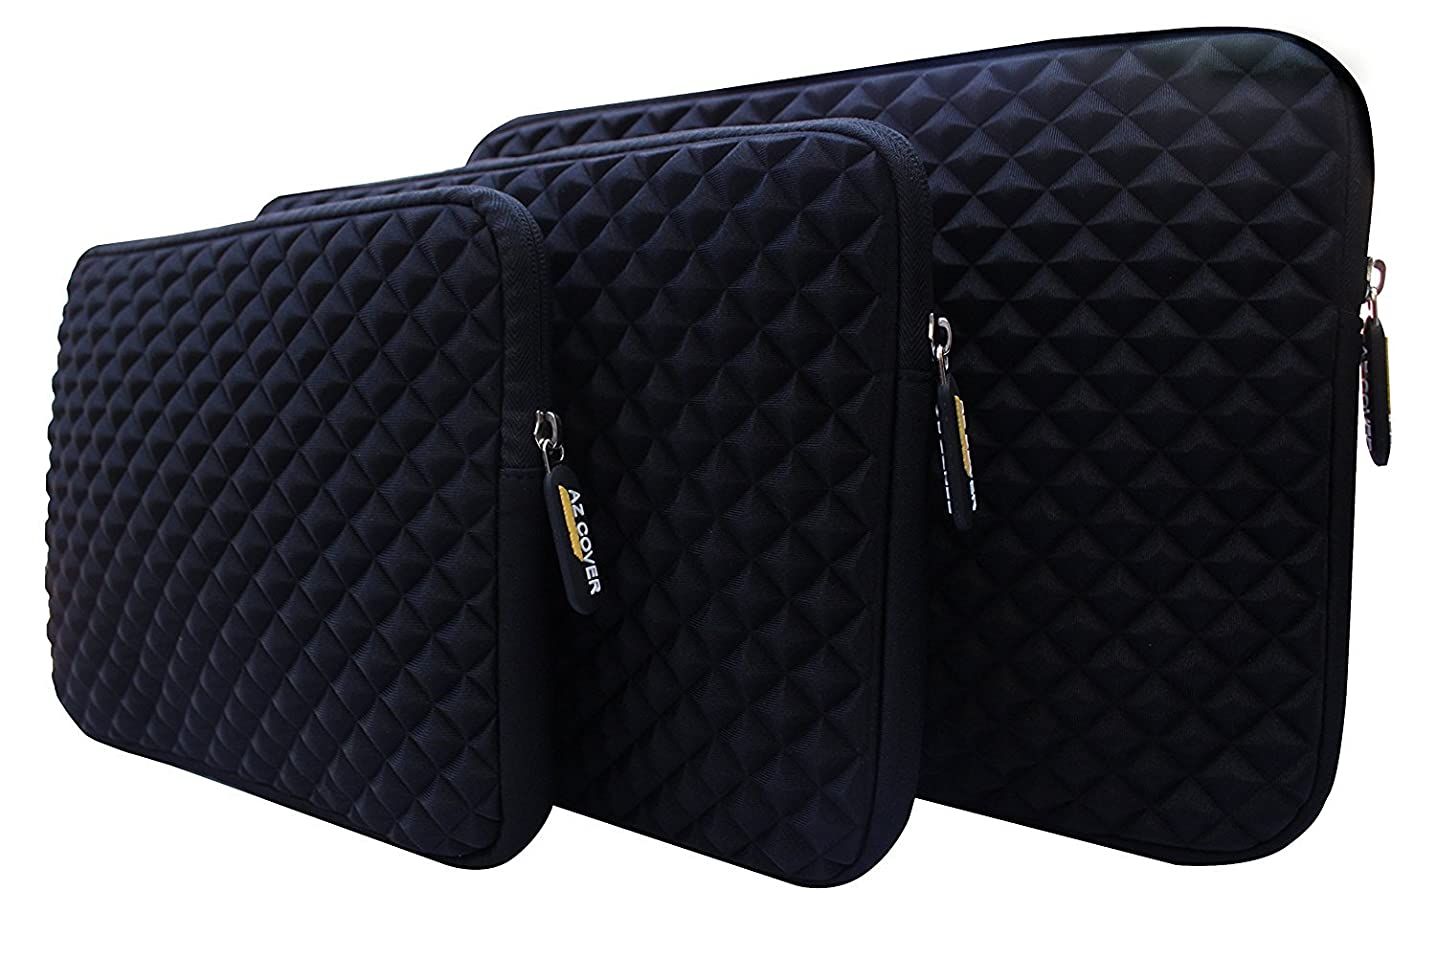 AZ-Cover 11.6-Inch Simplicity Stylish Diamond Foam Shock-Resistant Neoprene Sleeve (Black) For CUK Lenovo N21 11.6-inch Celeron N2840 2GB 16GB SSD Chrome OS Laptop Chromebook